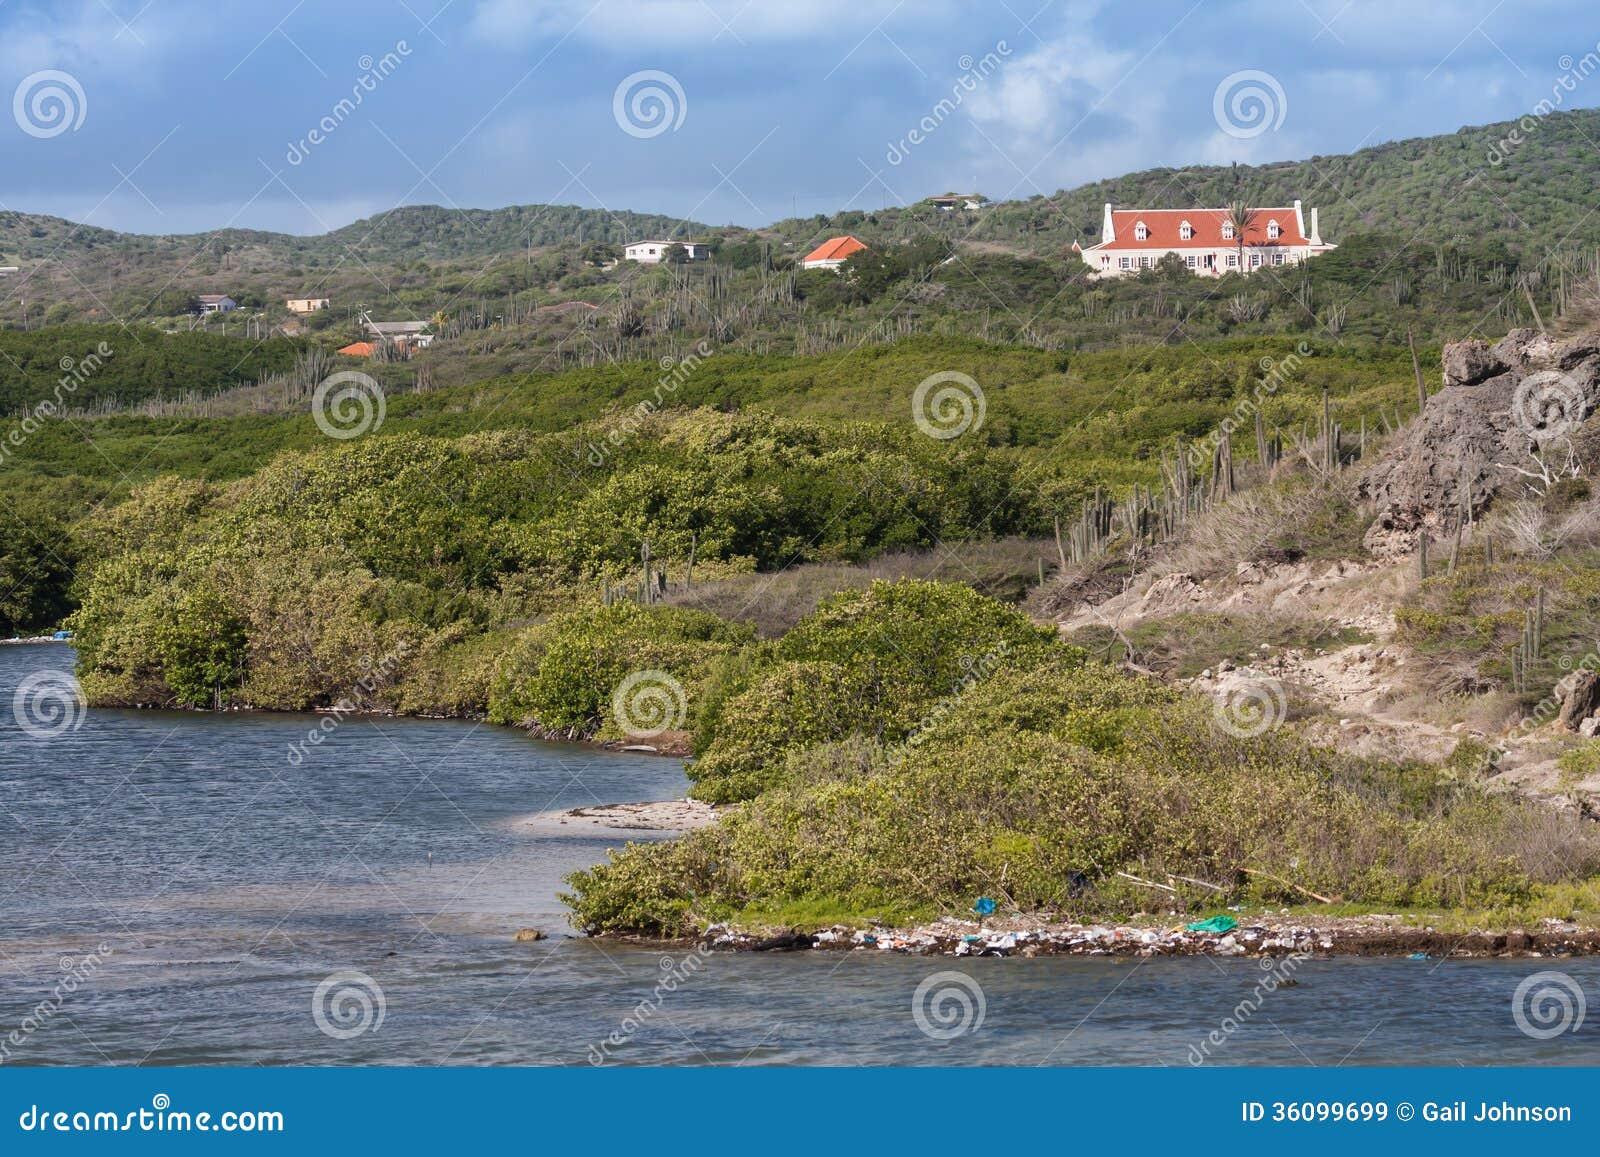 Uppstigning Landhuis Curacao